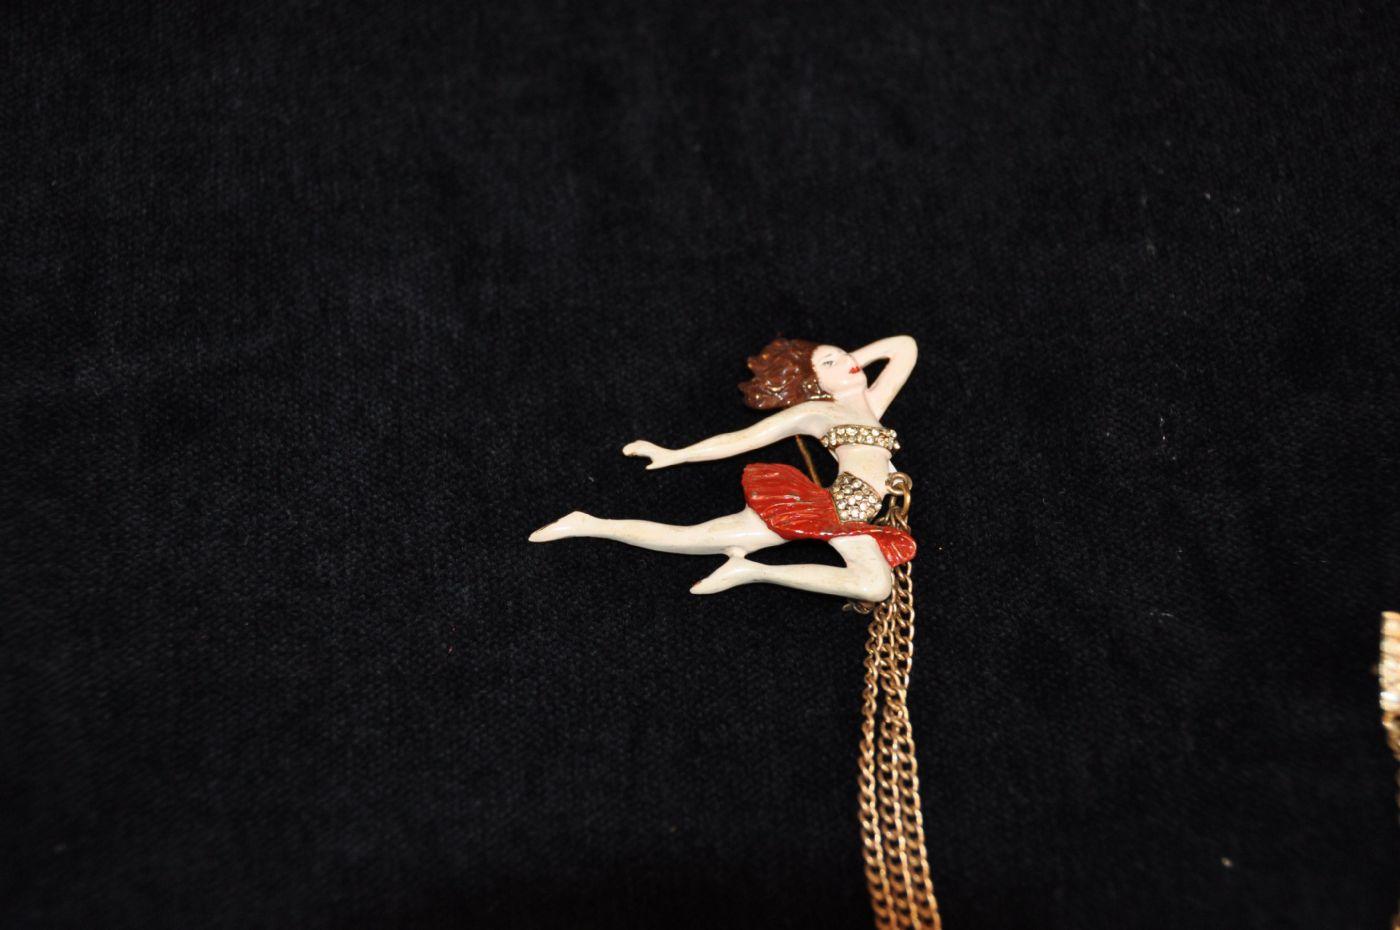 thumb2|Doppia spilla ballerina con note